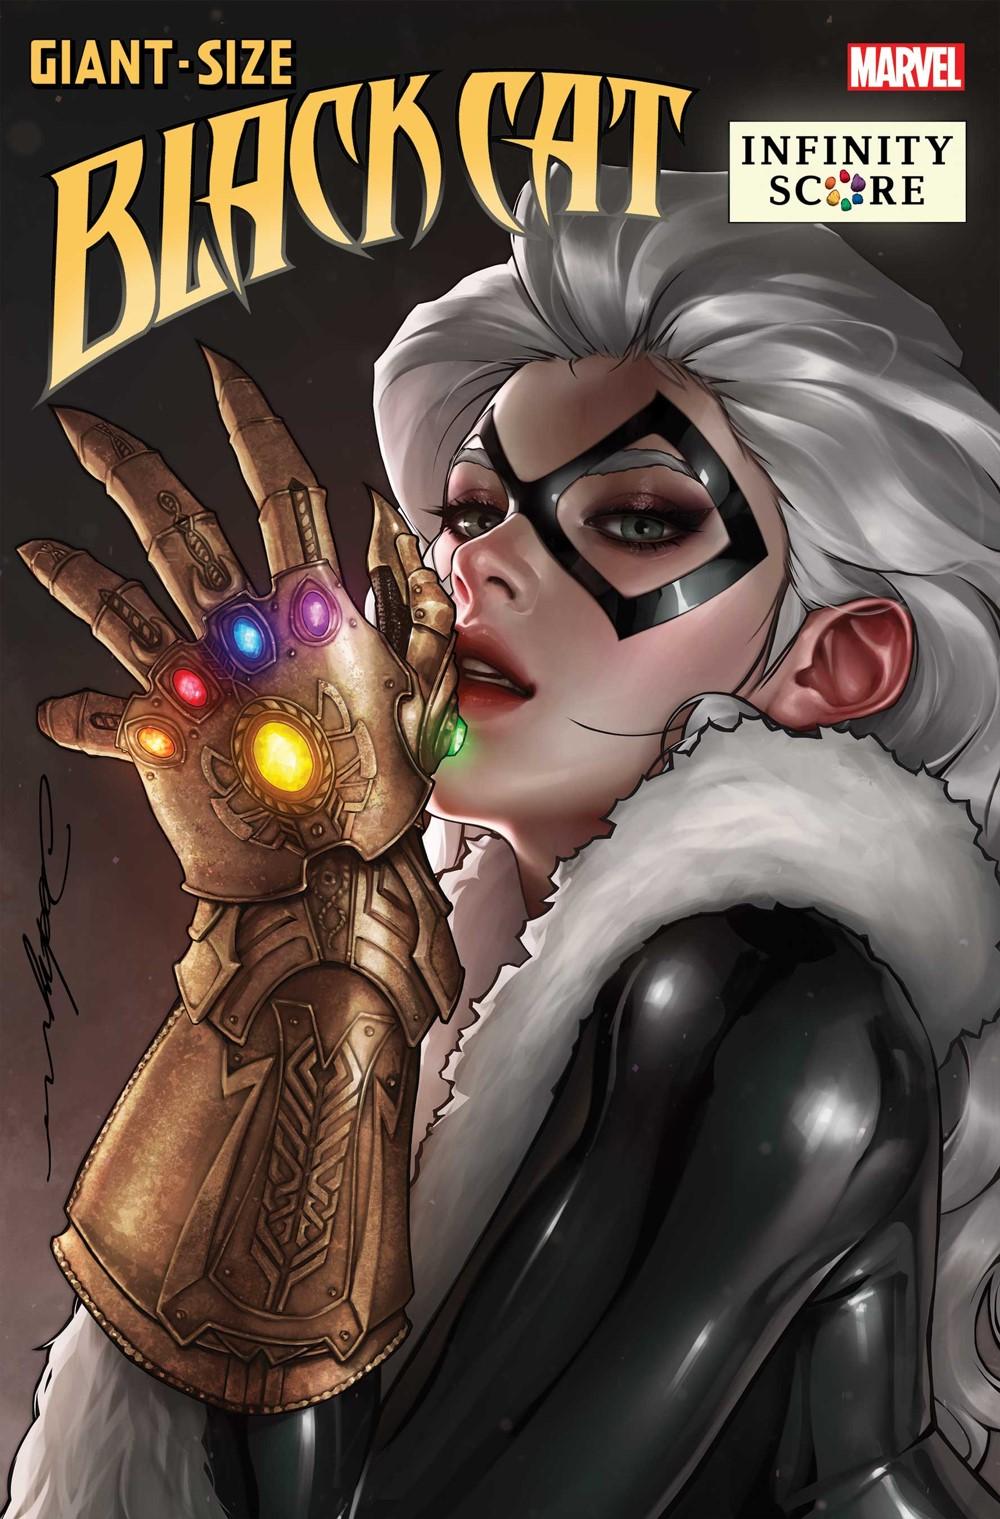 GSBLACKCATIS2021001_Lee-var Marvel Comics November 2021 Solicitations